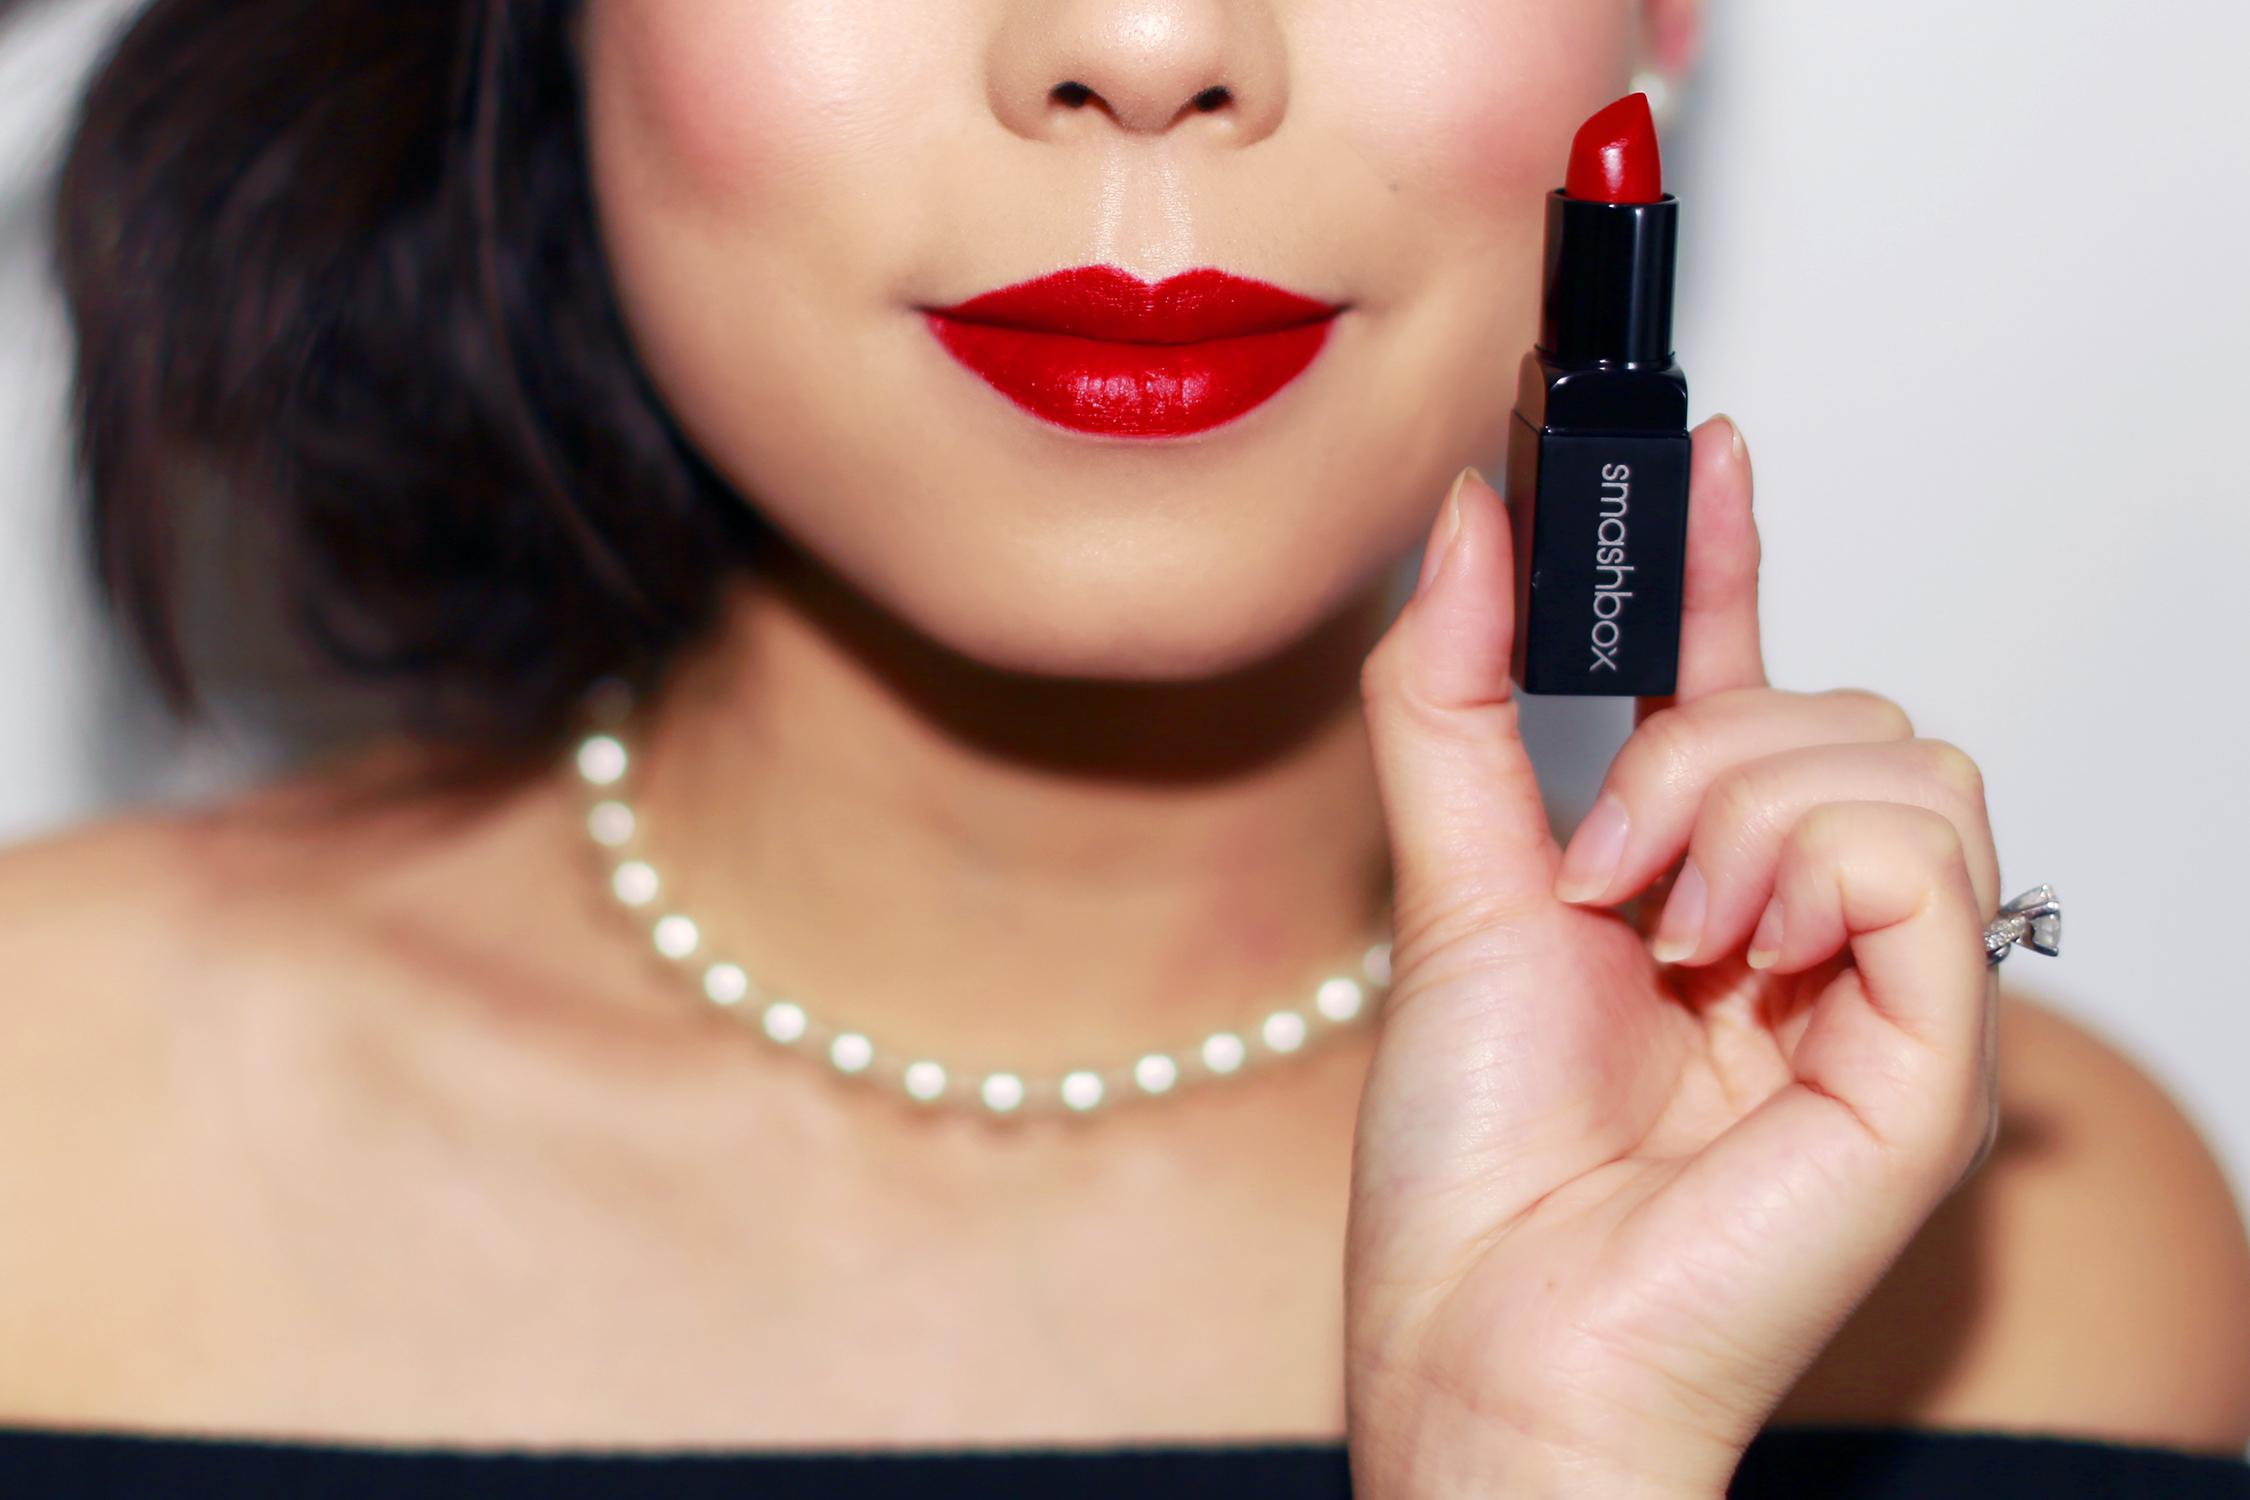 Hautepinkpretty Bold Velvet Lip Statements With Ulta Beauty